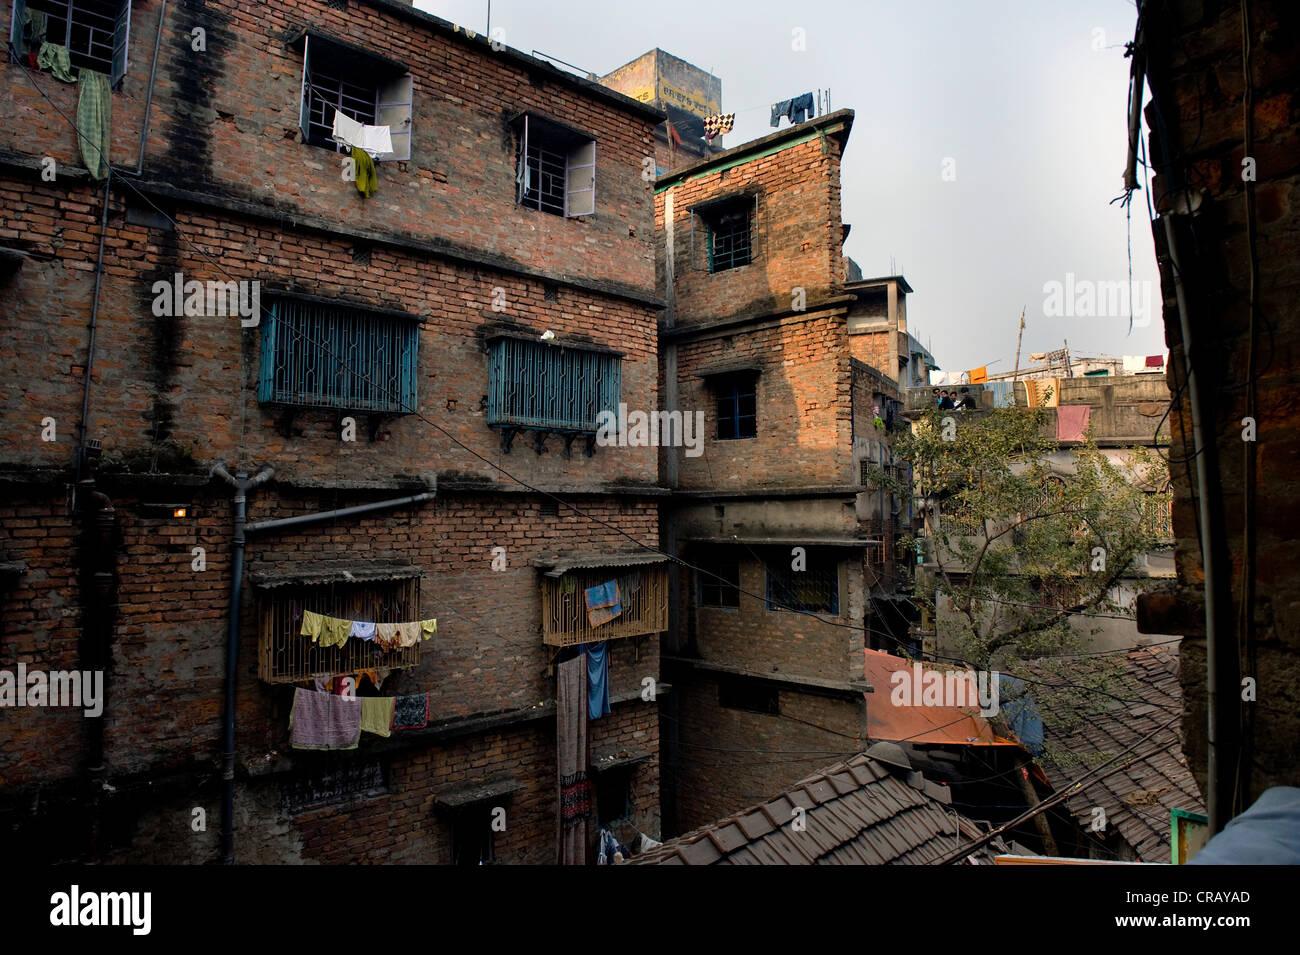 Decrepit apartment building, Shibpur district, Howrah, Kolkata, West Bengal, India, Asia - Stock Image